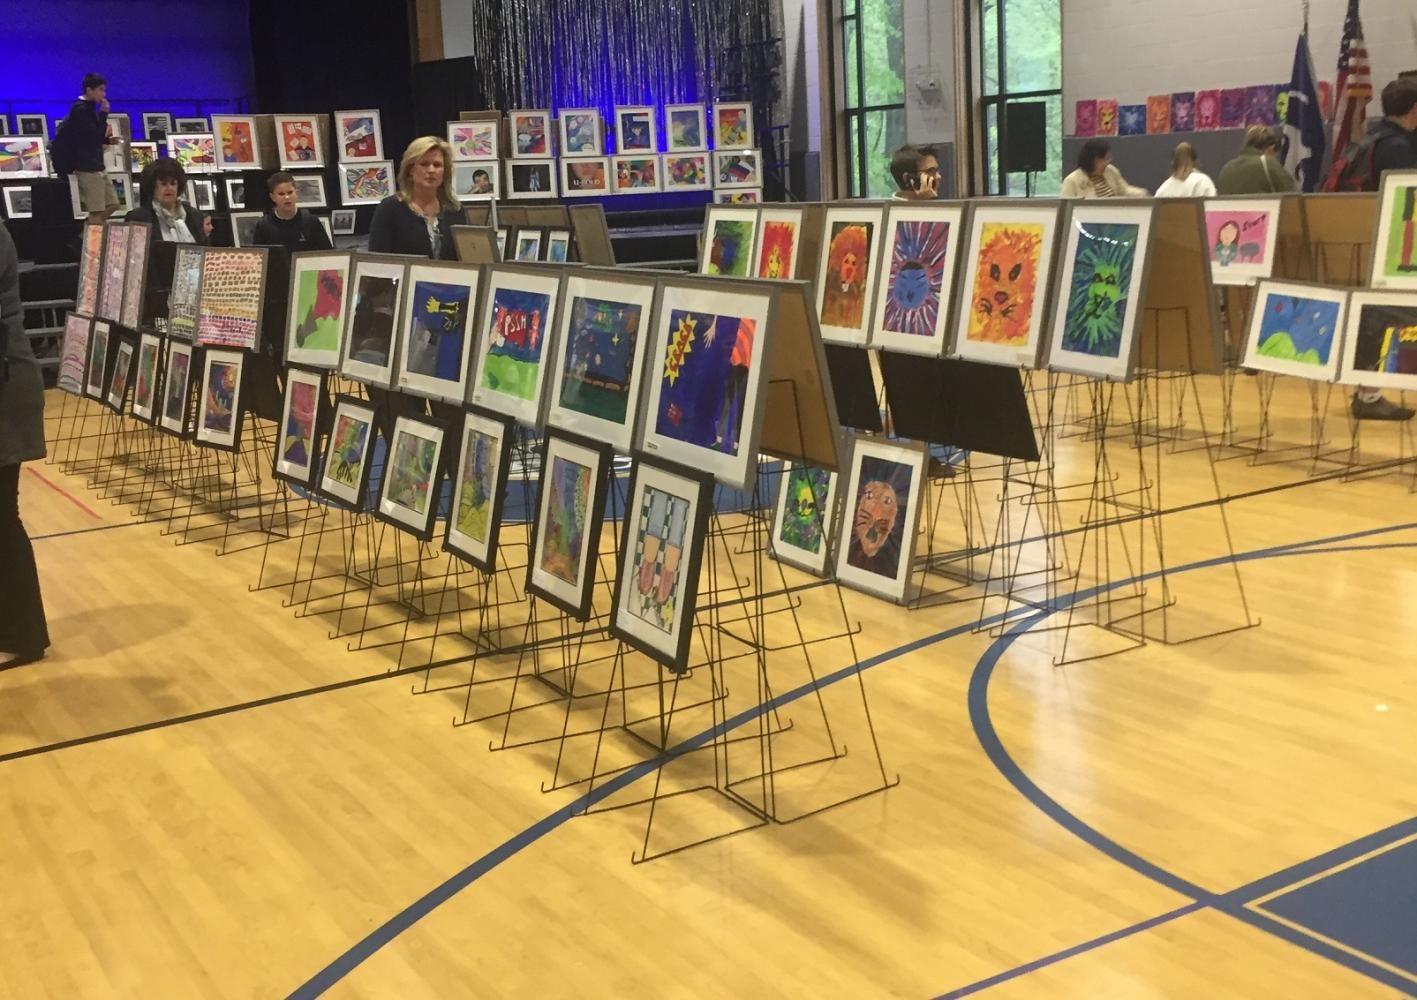 School-Wide Art Expo Exhibits Student Creativity, Artistic Eyes